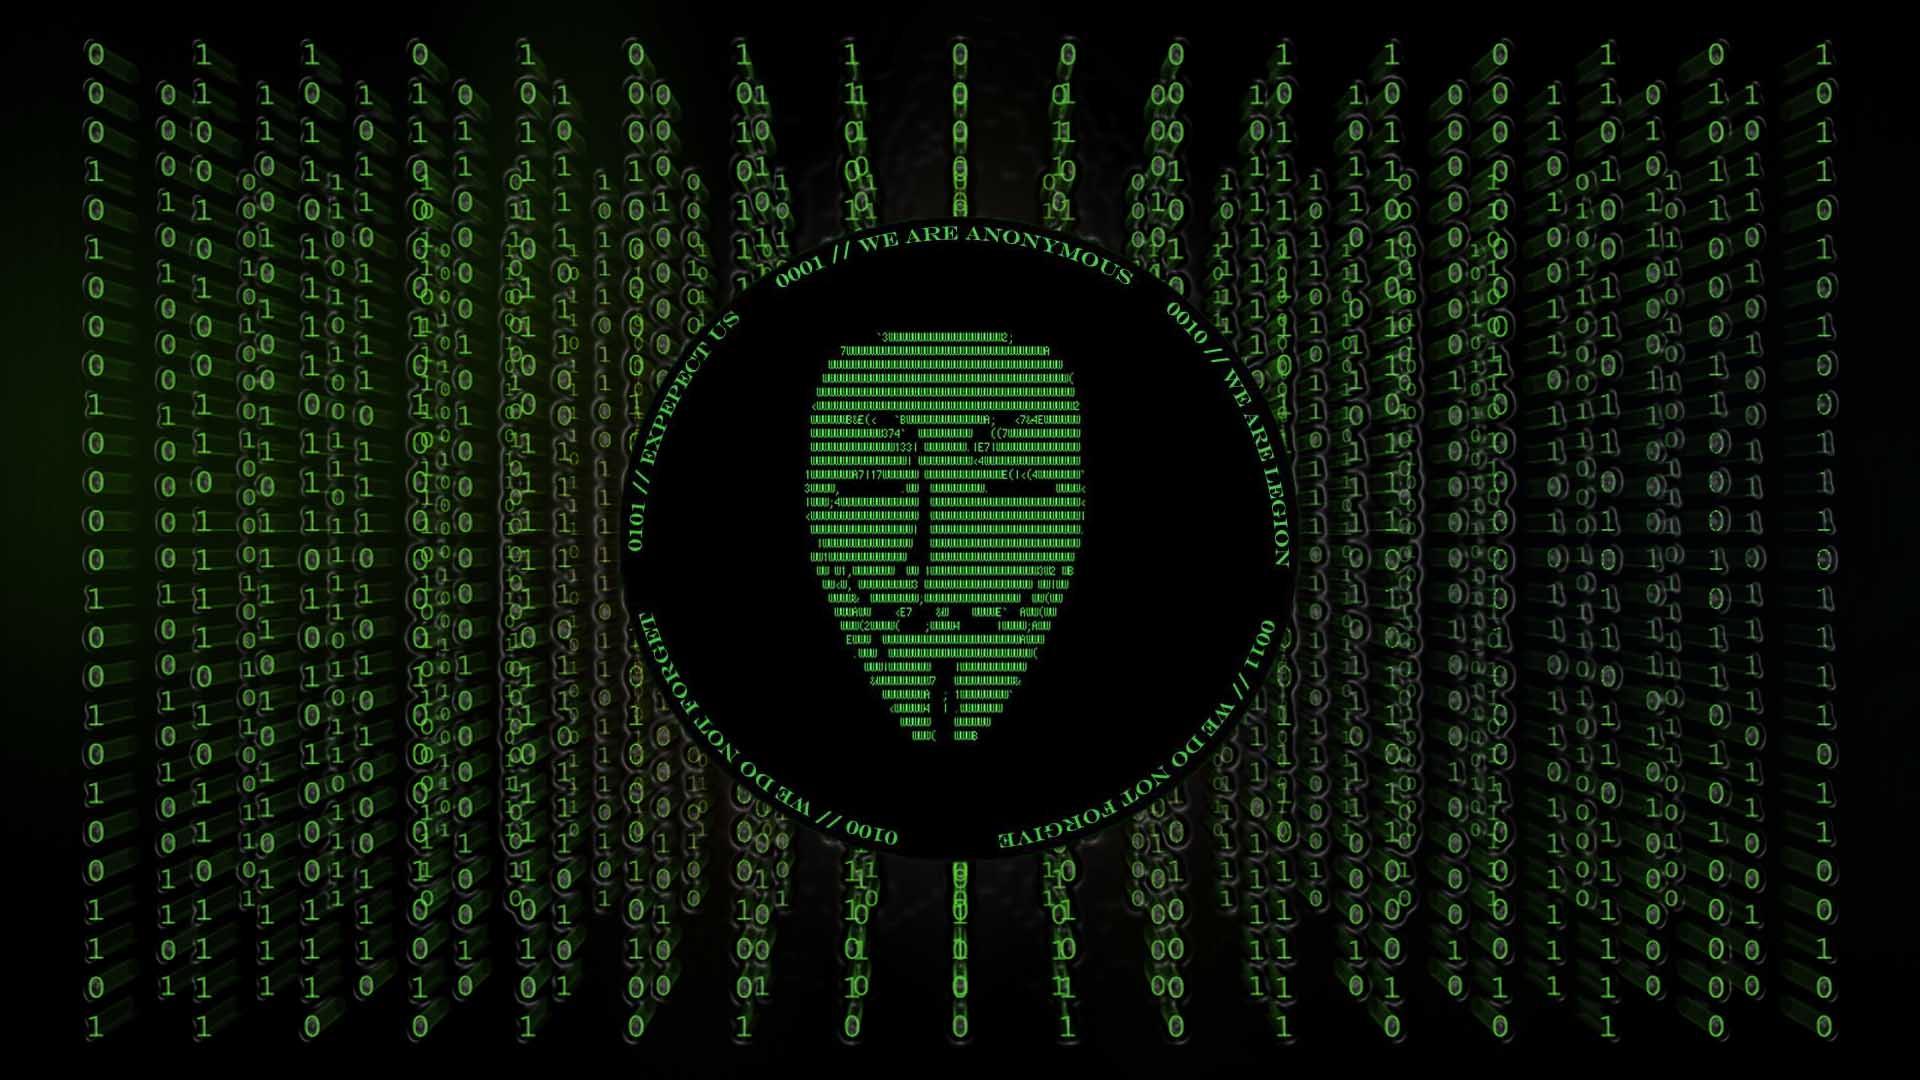 [Jeu] Association d'images - Page 4 Anonymous-hackers-1